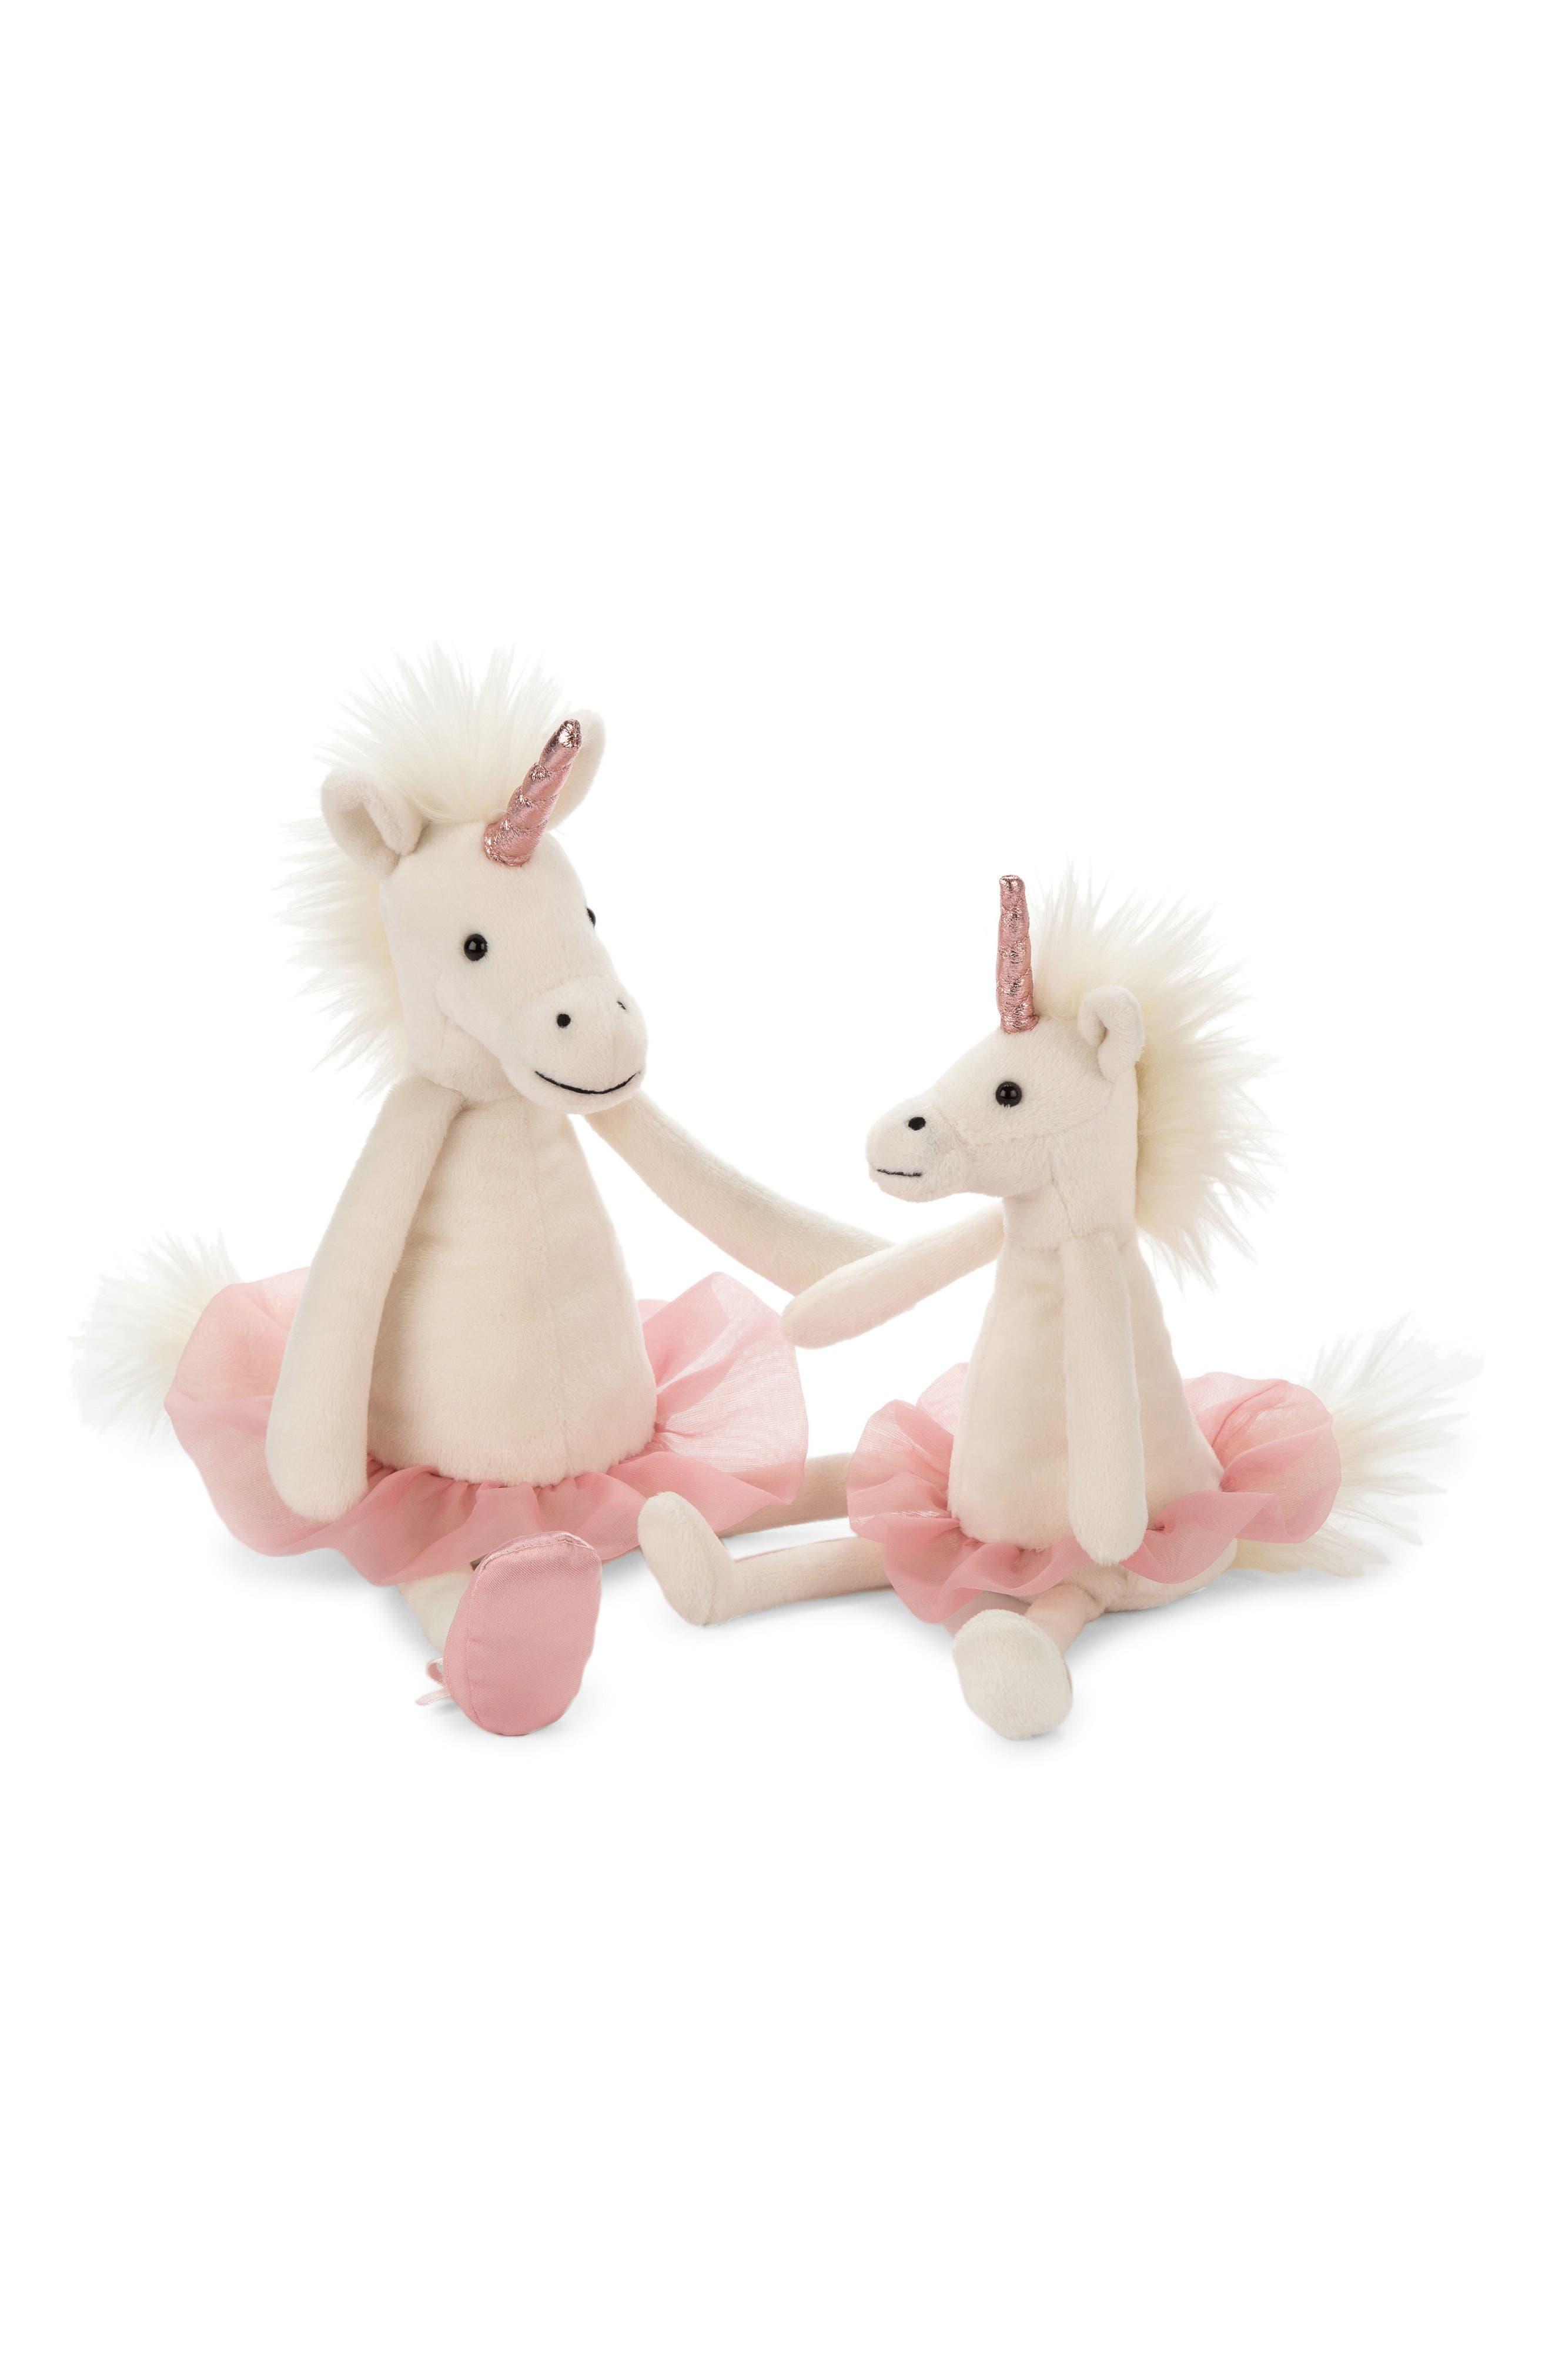 Dancing Darcy Unicorn Stuffed Animal,                             Alternate thumbnail 2, color,                             CREAM / PINK